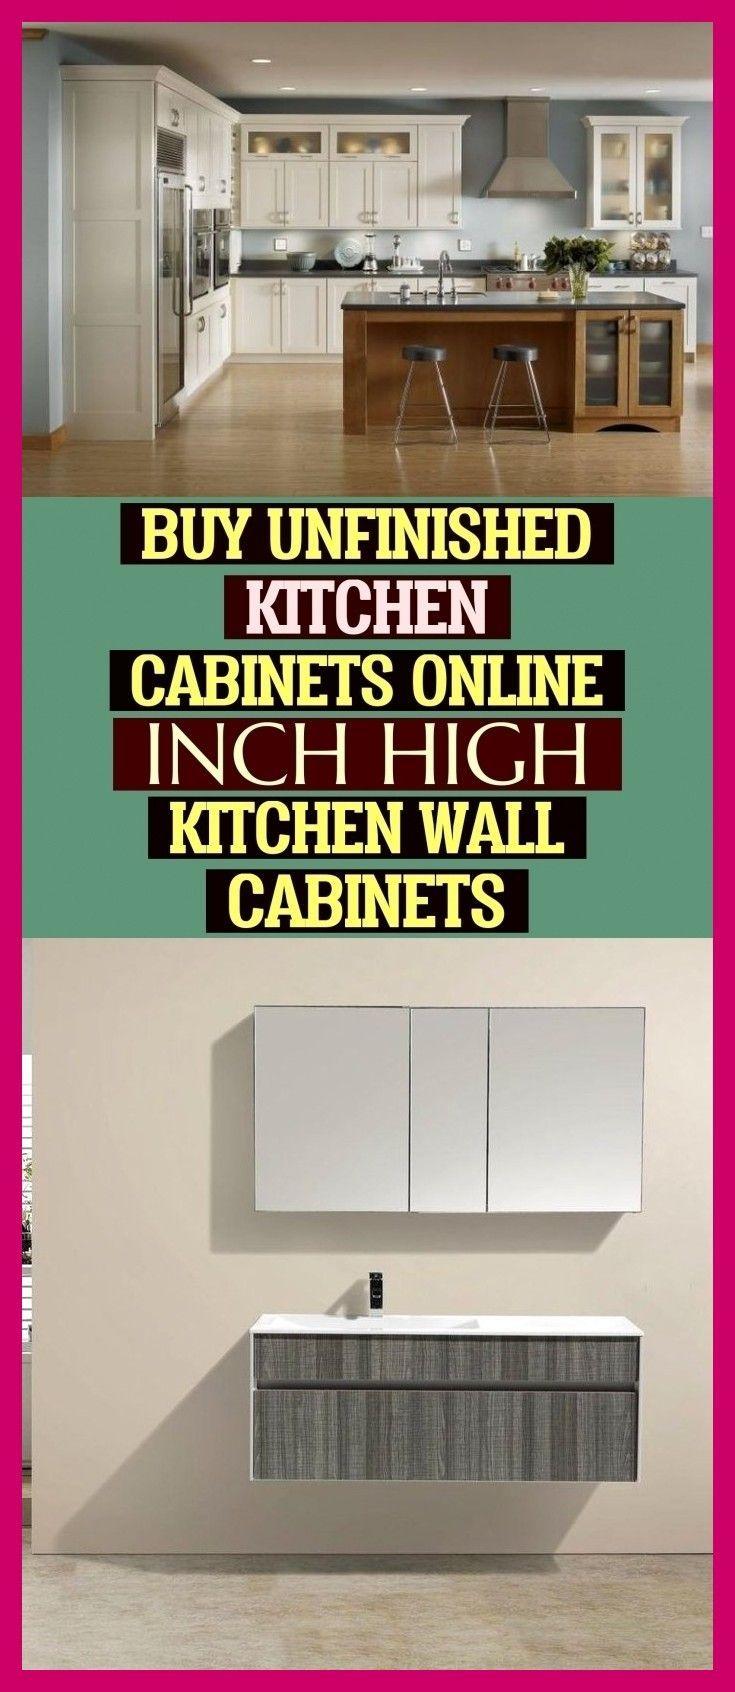 Buy Unfinished Kitchen Cabinets Online Kitchen Cabinets Inch By Inch Farmho In 2020 Online Kitchen Cabinets Unfinished Kitchen Cabinets Kitchen Wall Cabinets